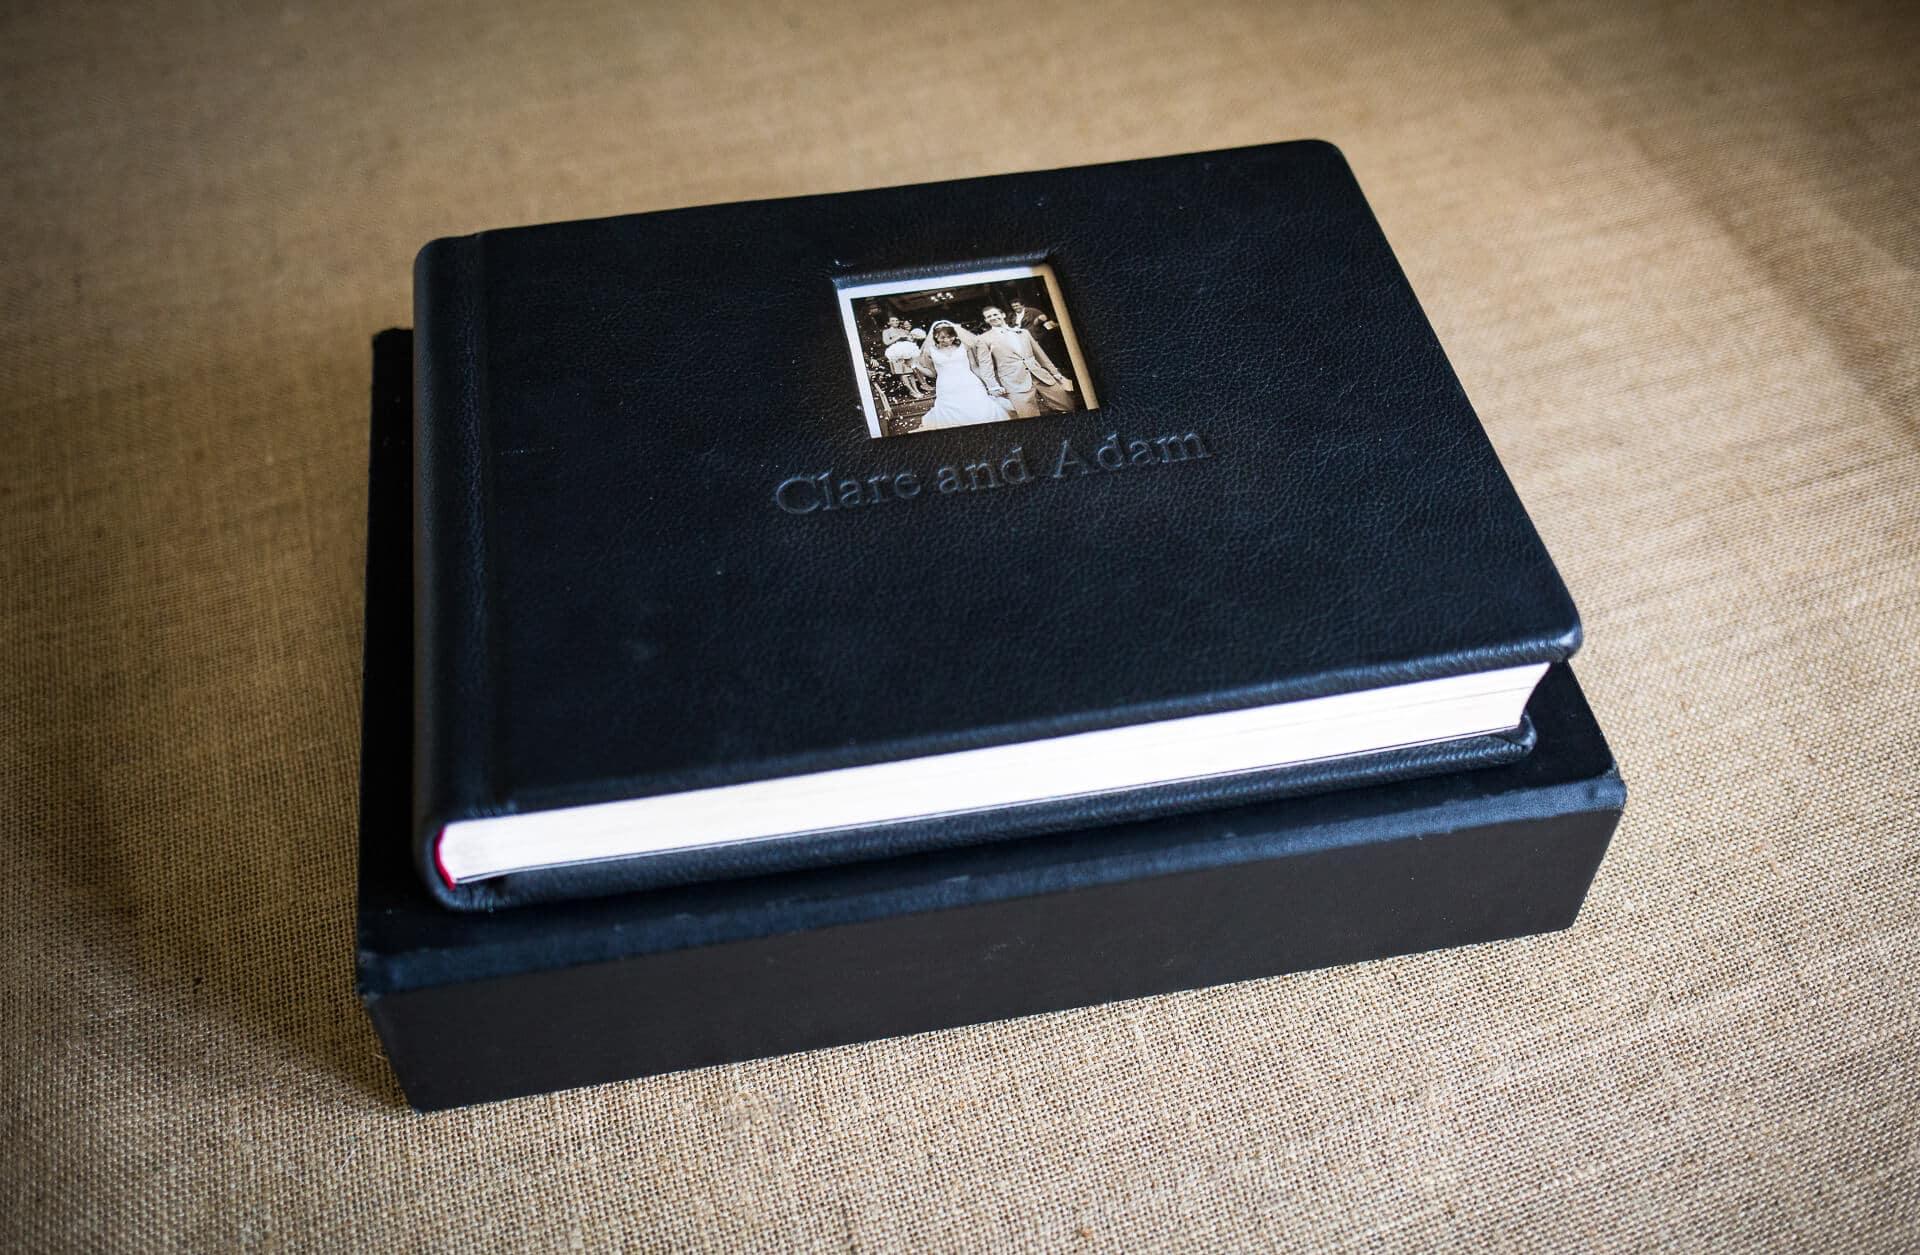 Graphi studio wedding album and box